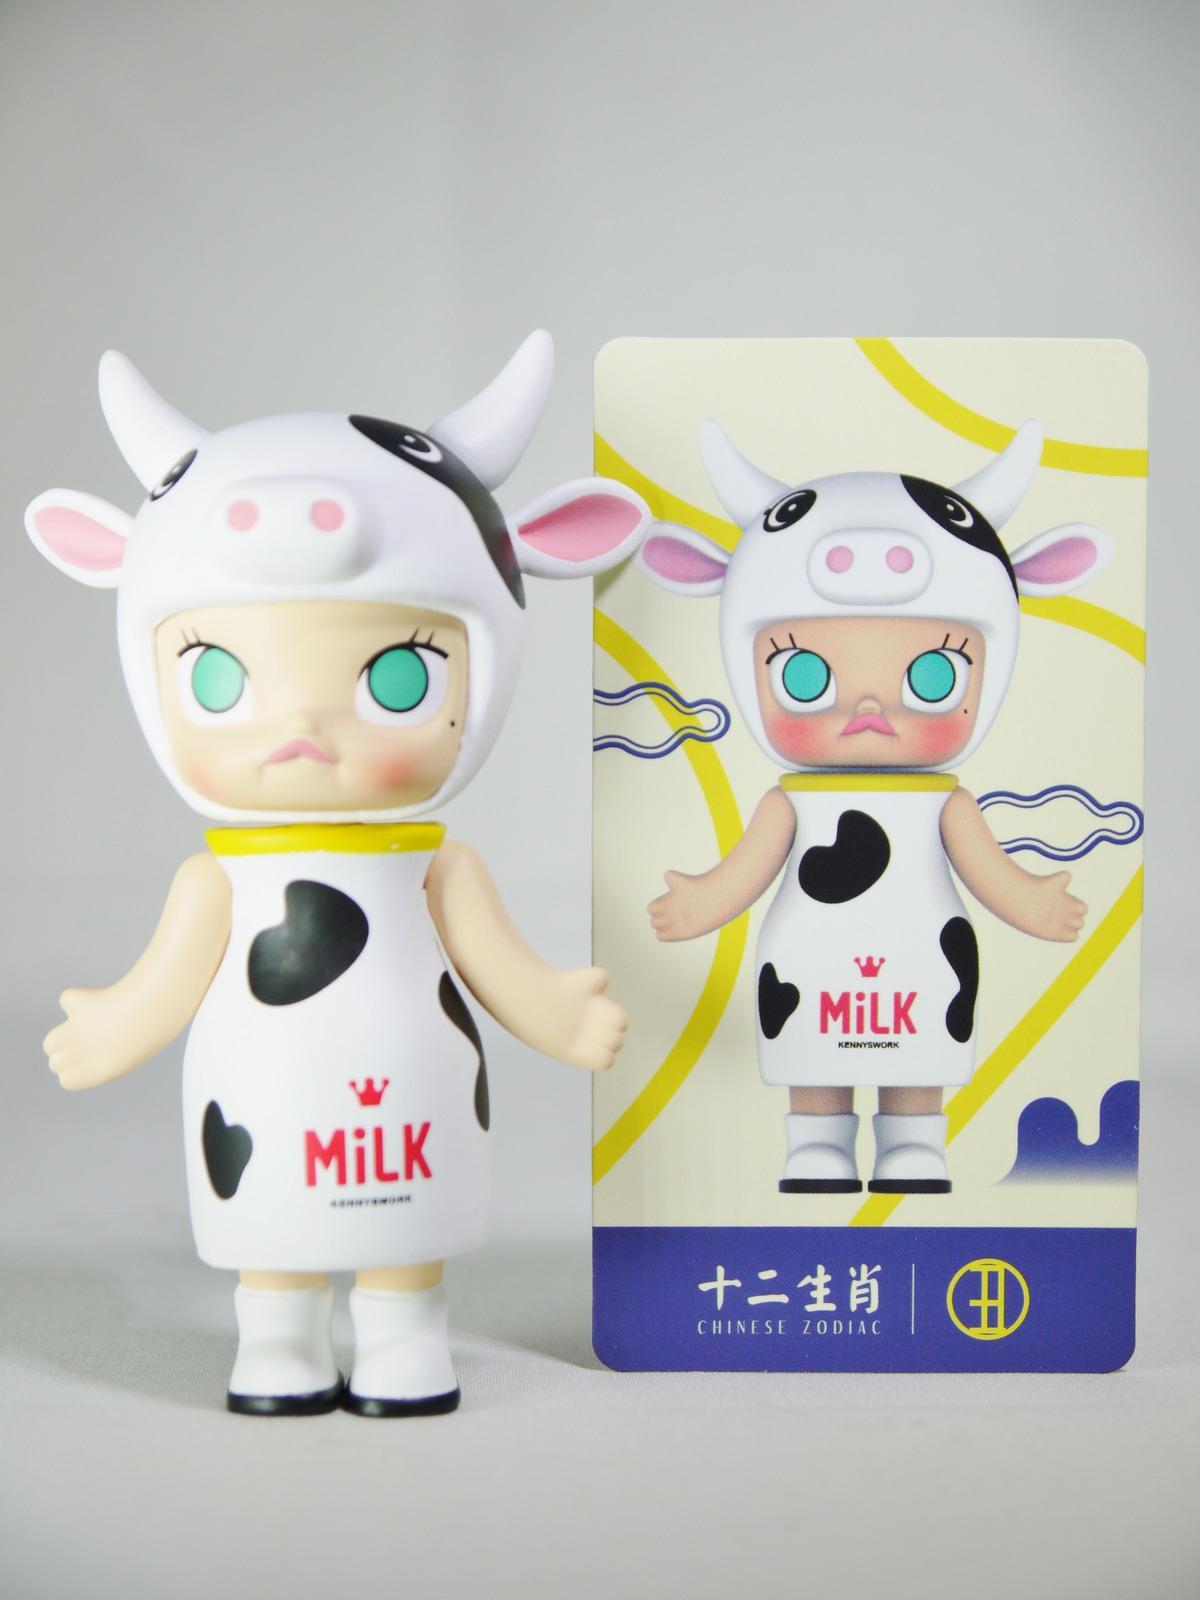 POP MART Kennyswork BLOCK Little Molly Chinese Zodiac OX Cow White Minifigure